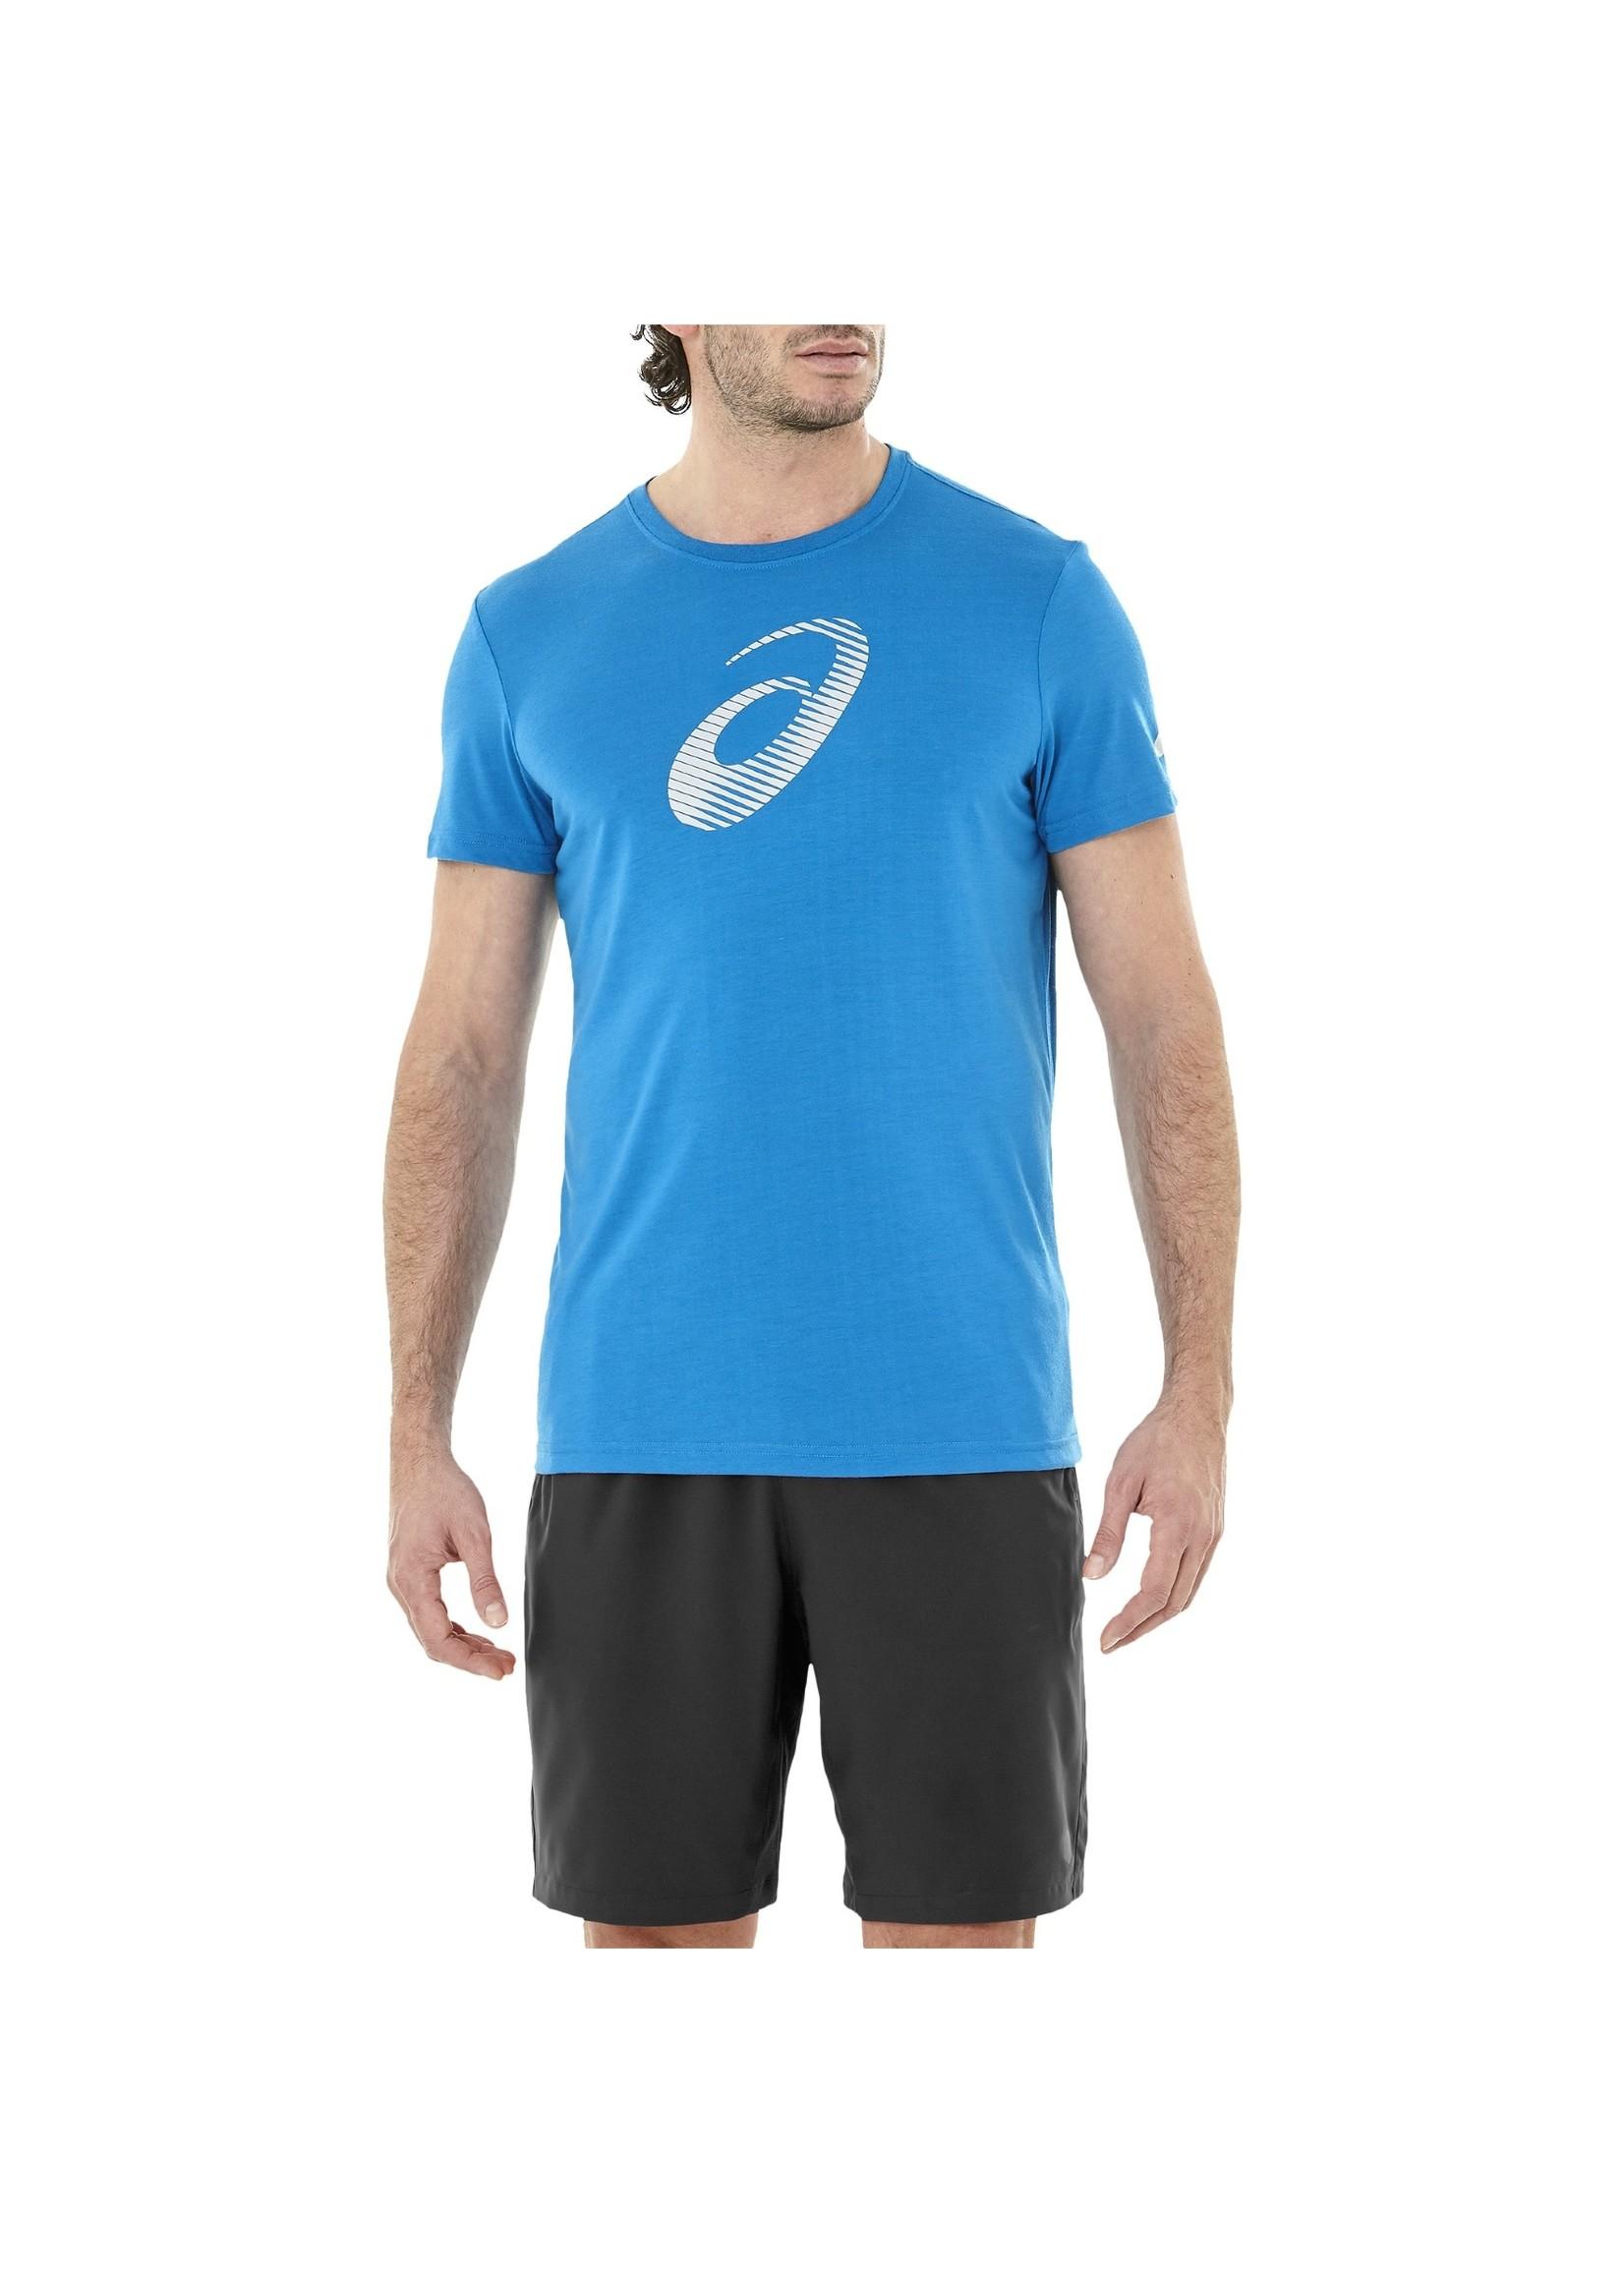 Asics Asics Mens GPX SS Fitness & Training Top, Race Blue